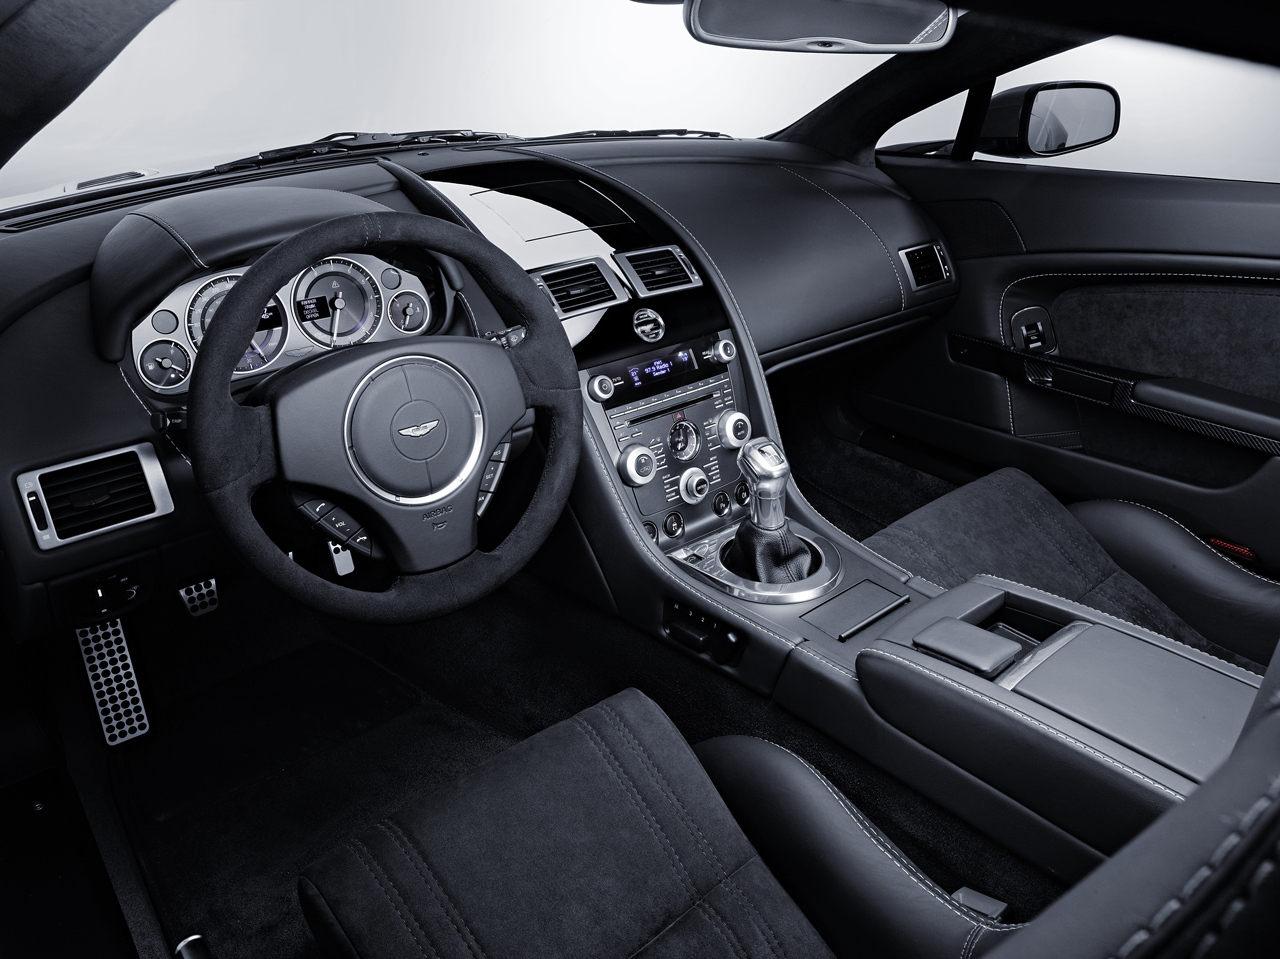 aston martin db9 2014 interior. aston martin db9 interior 2014 i